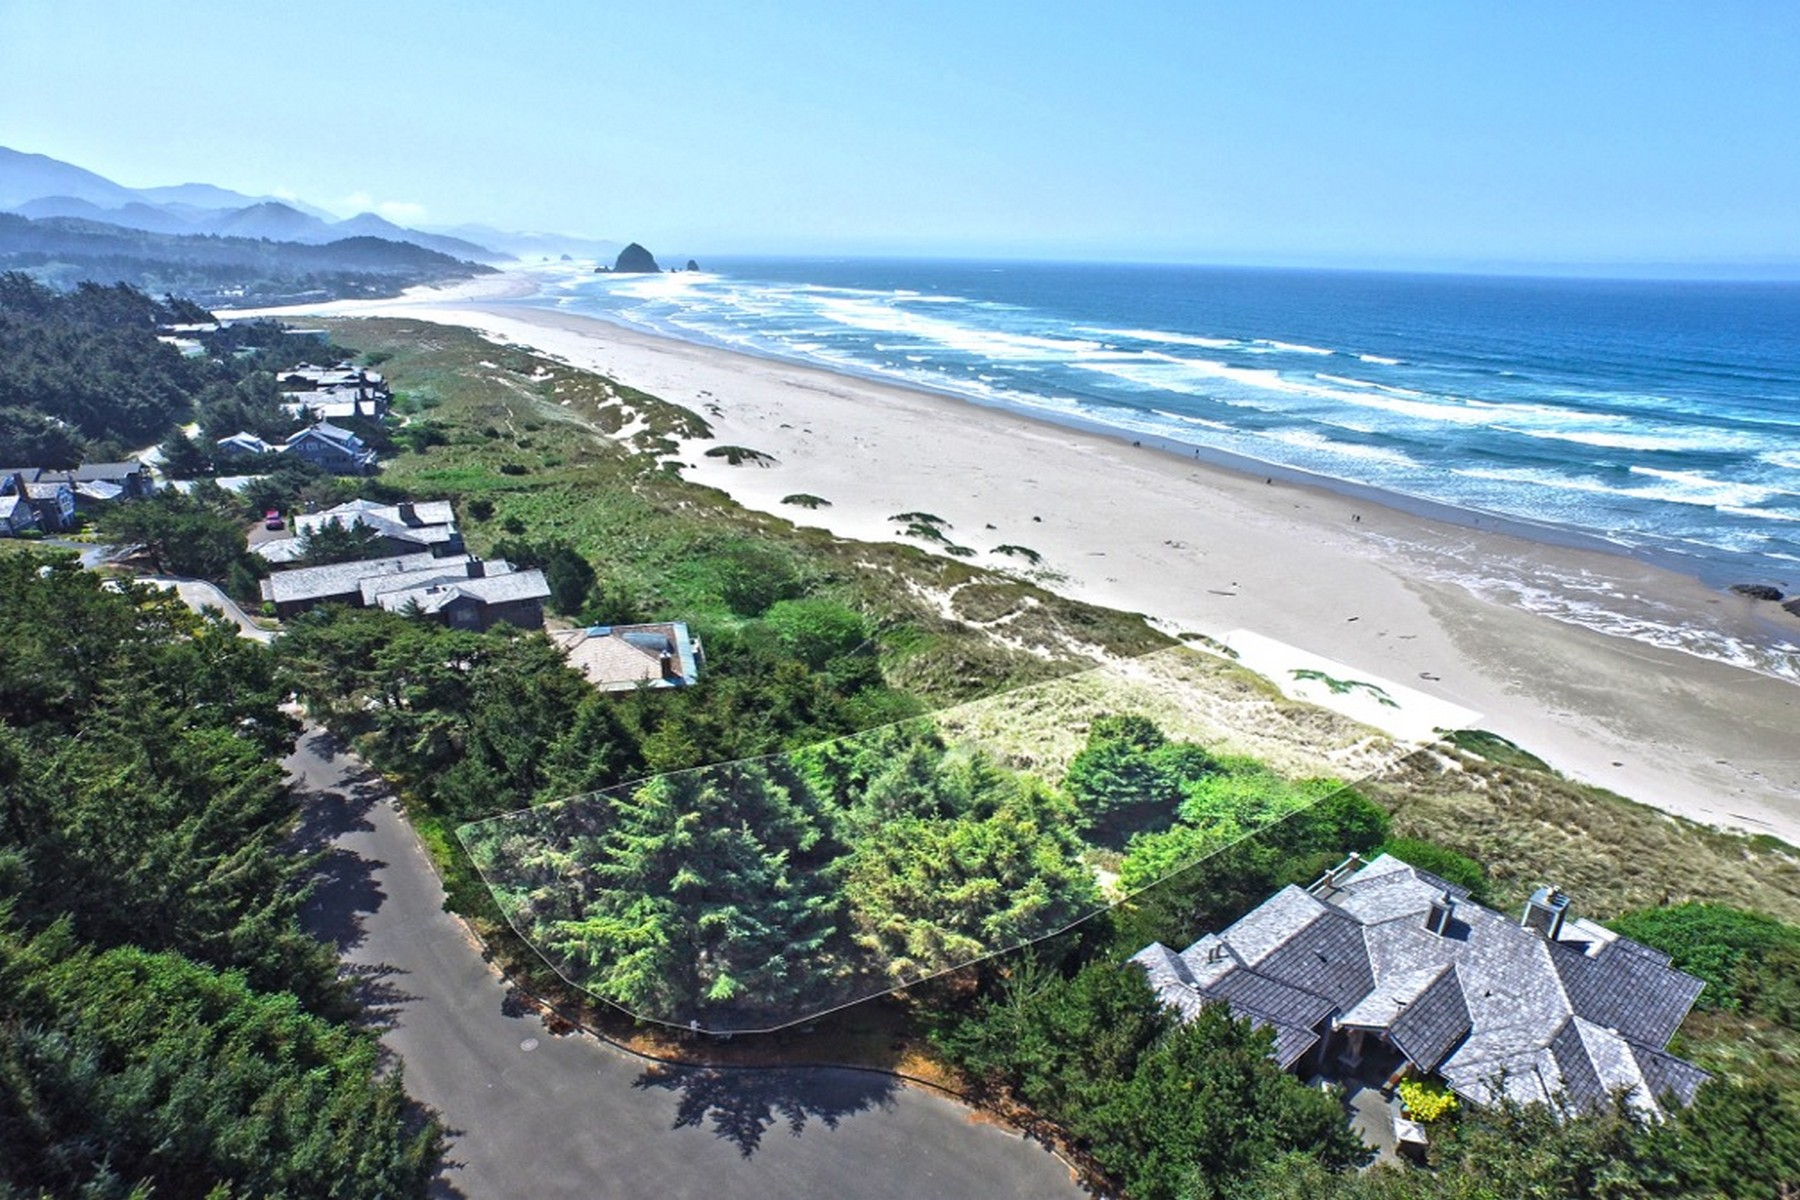 Đất đai vì Bán tại Oceanfront Lot in Chapman Point Oak Court Chapman Point Cannon Beach, Oregon 97110 Hoa Kỳ